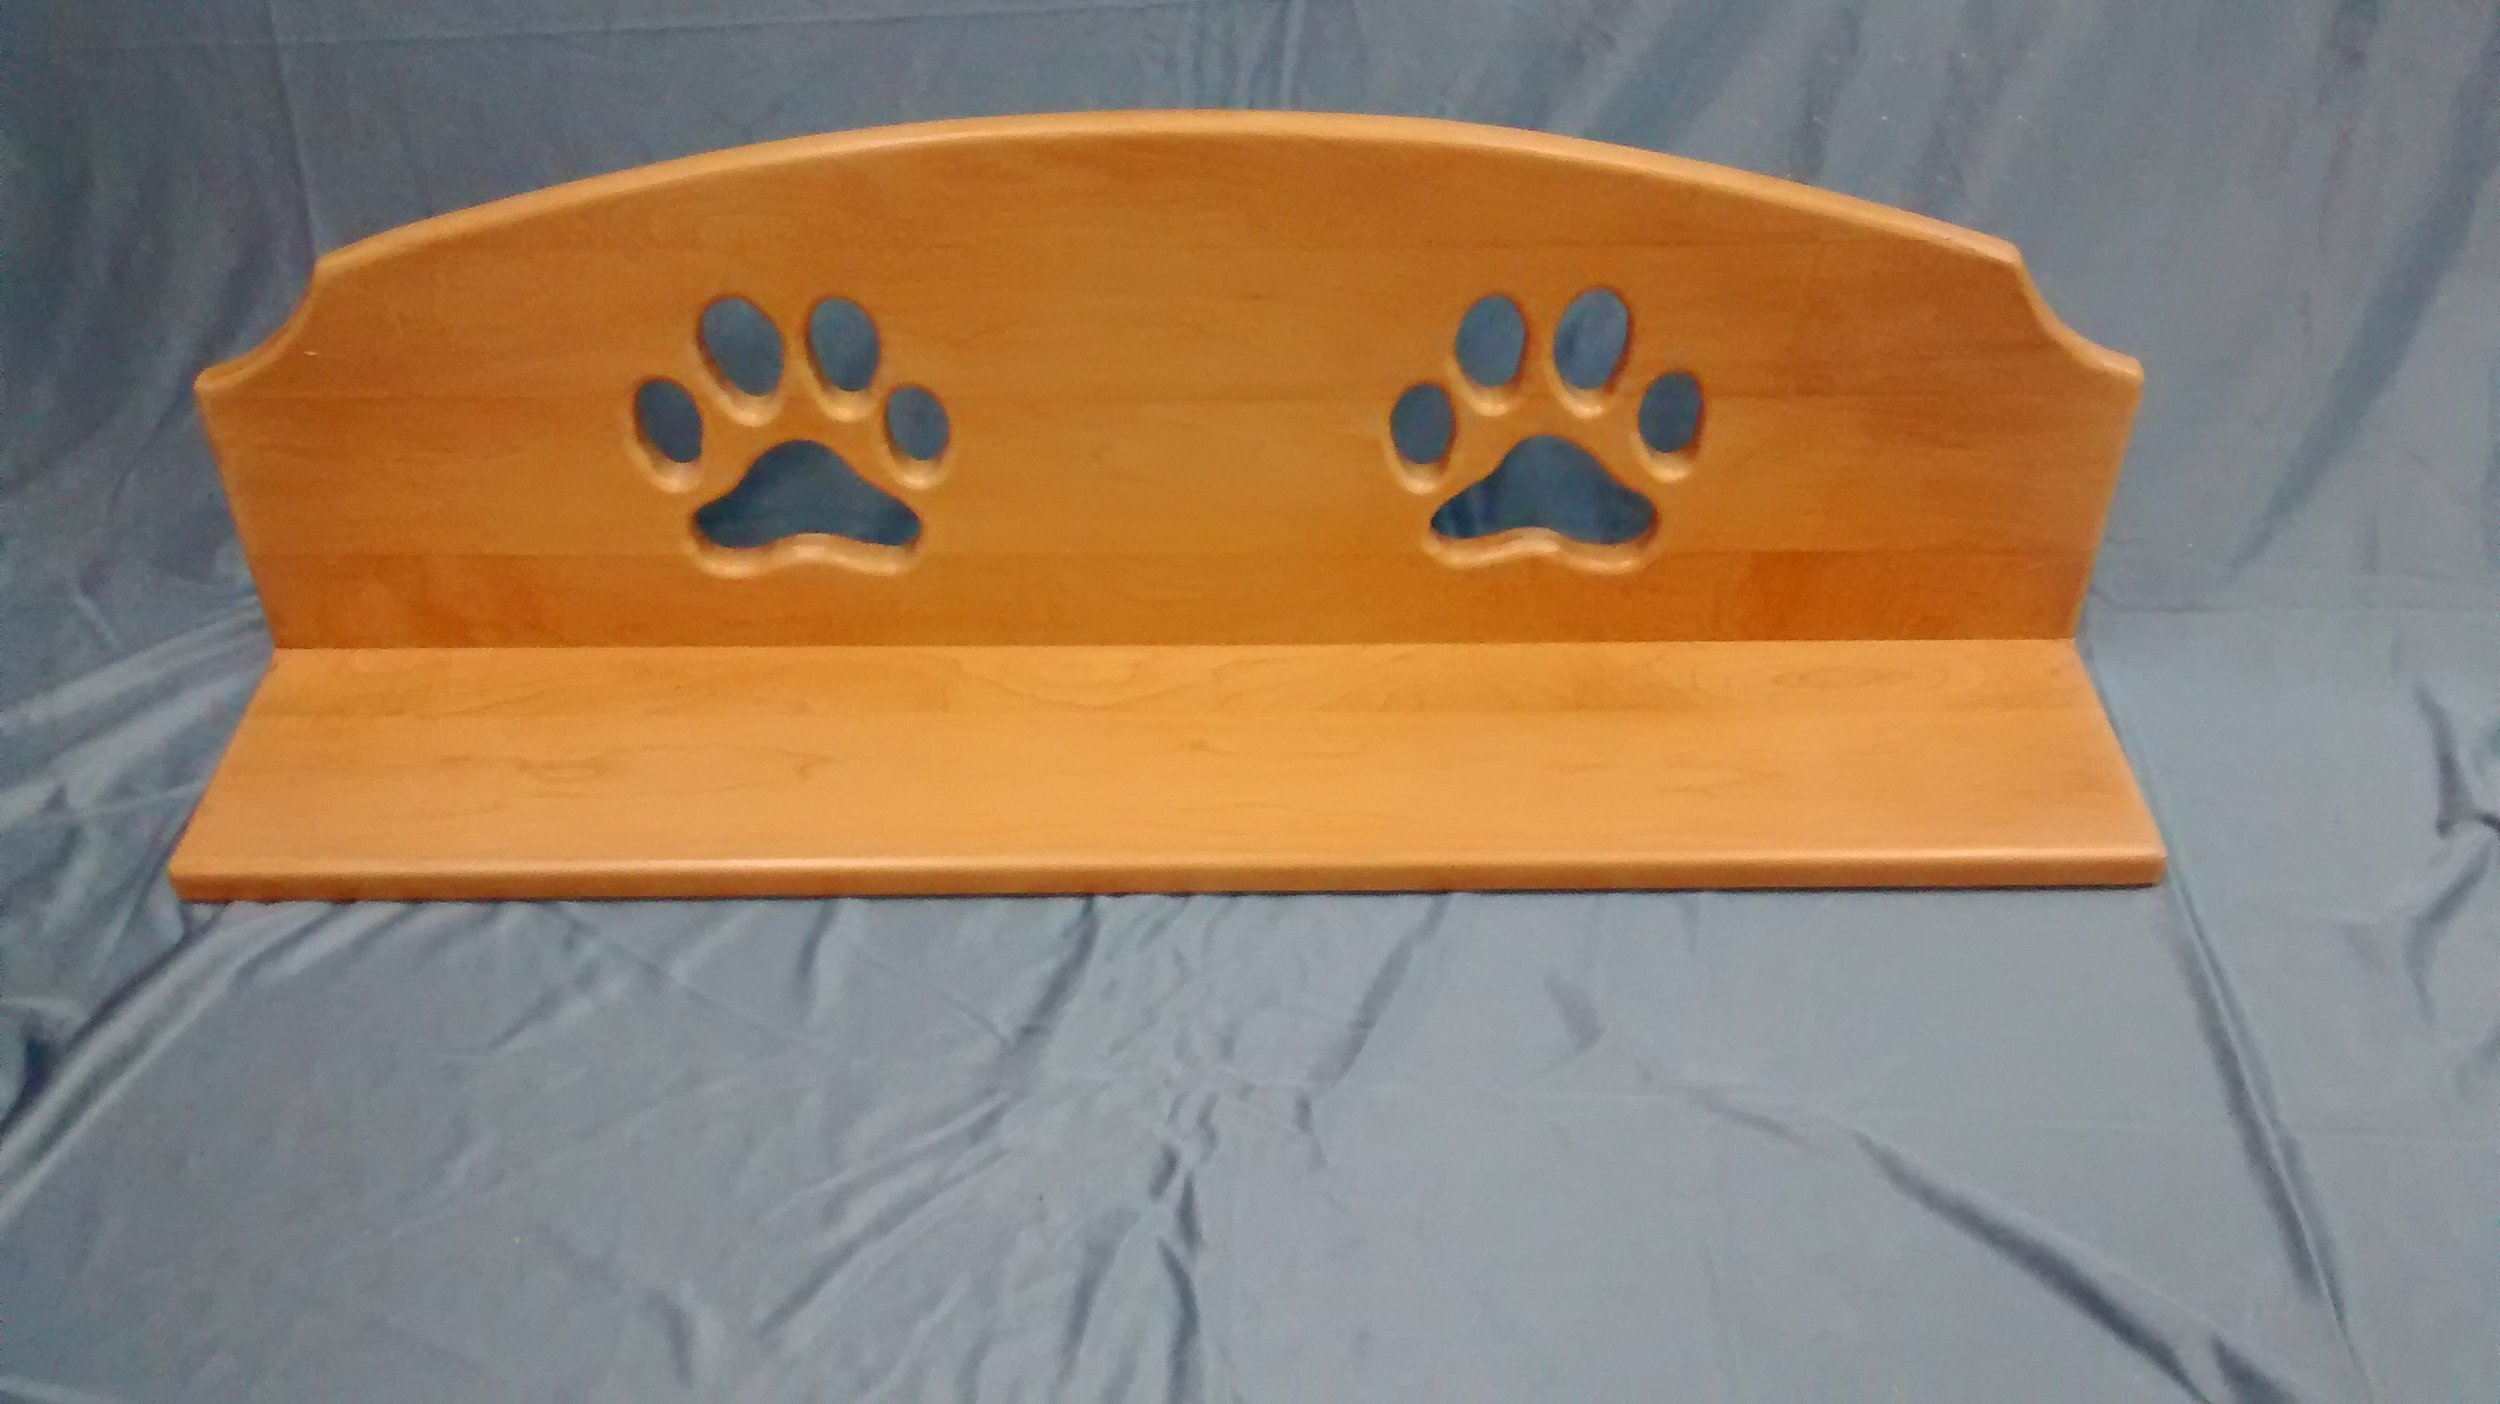 Shelf with Two Dog Pawprint Cutouts